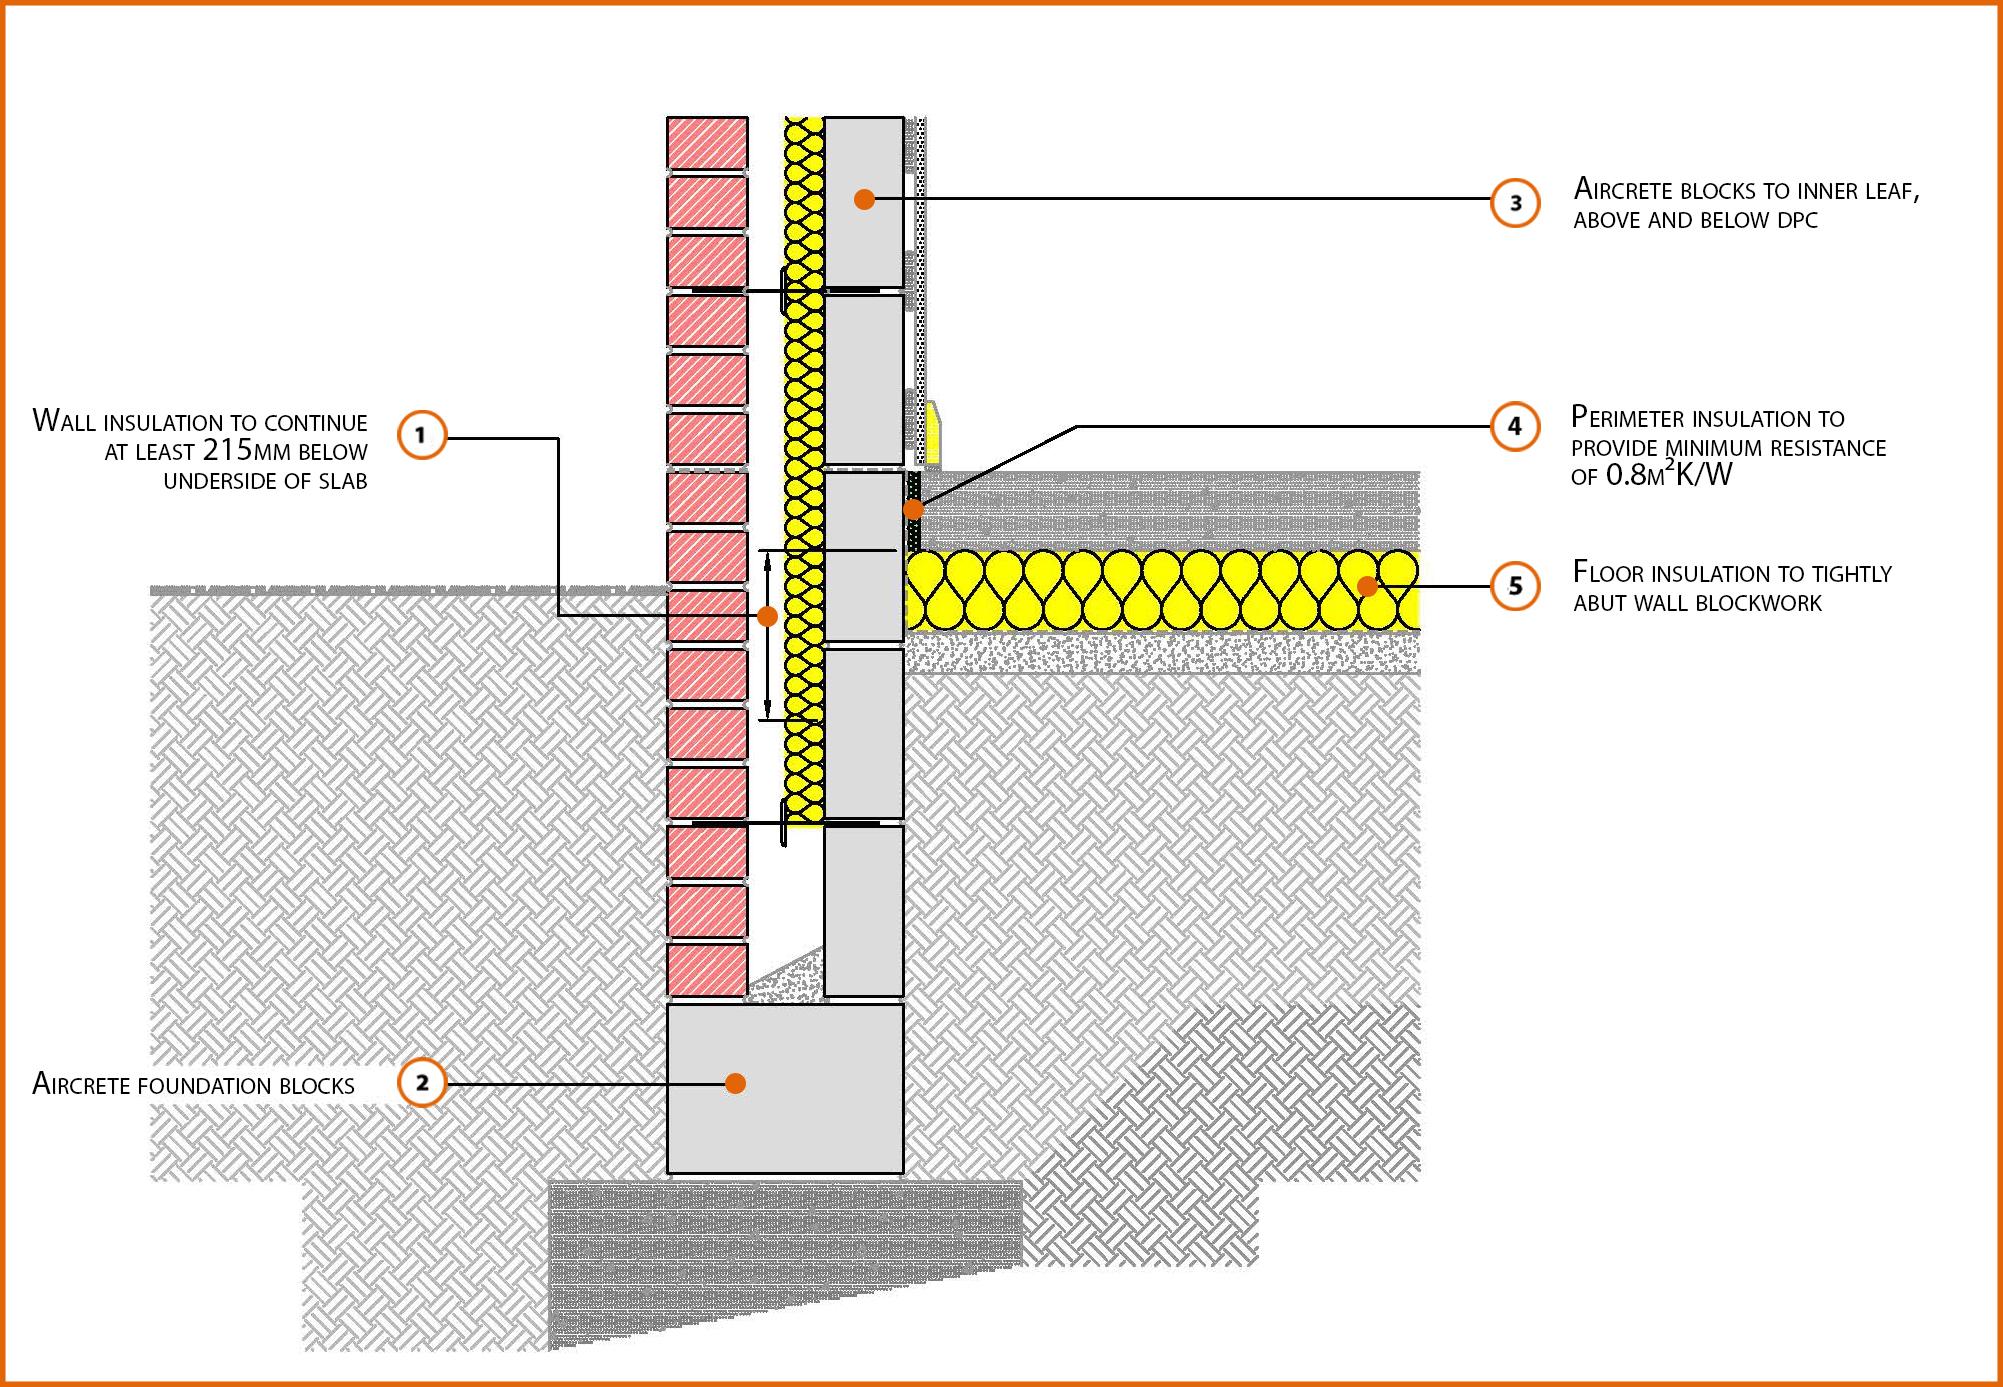 E5mcpf27 Concrete Ground Bearing Floor Insulation Below